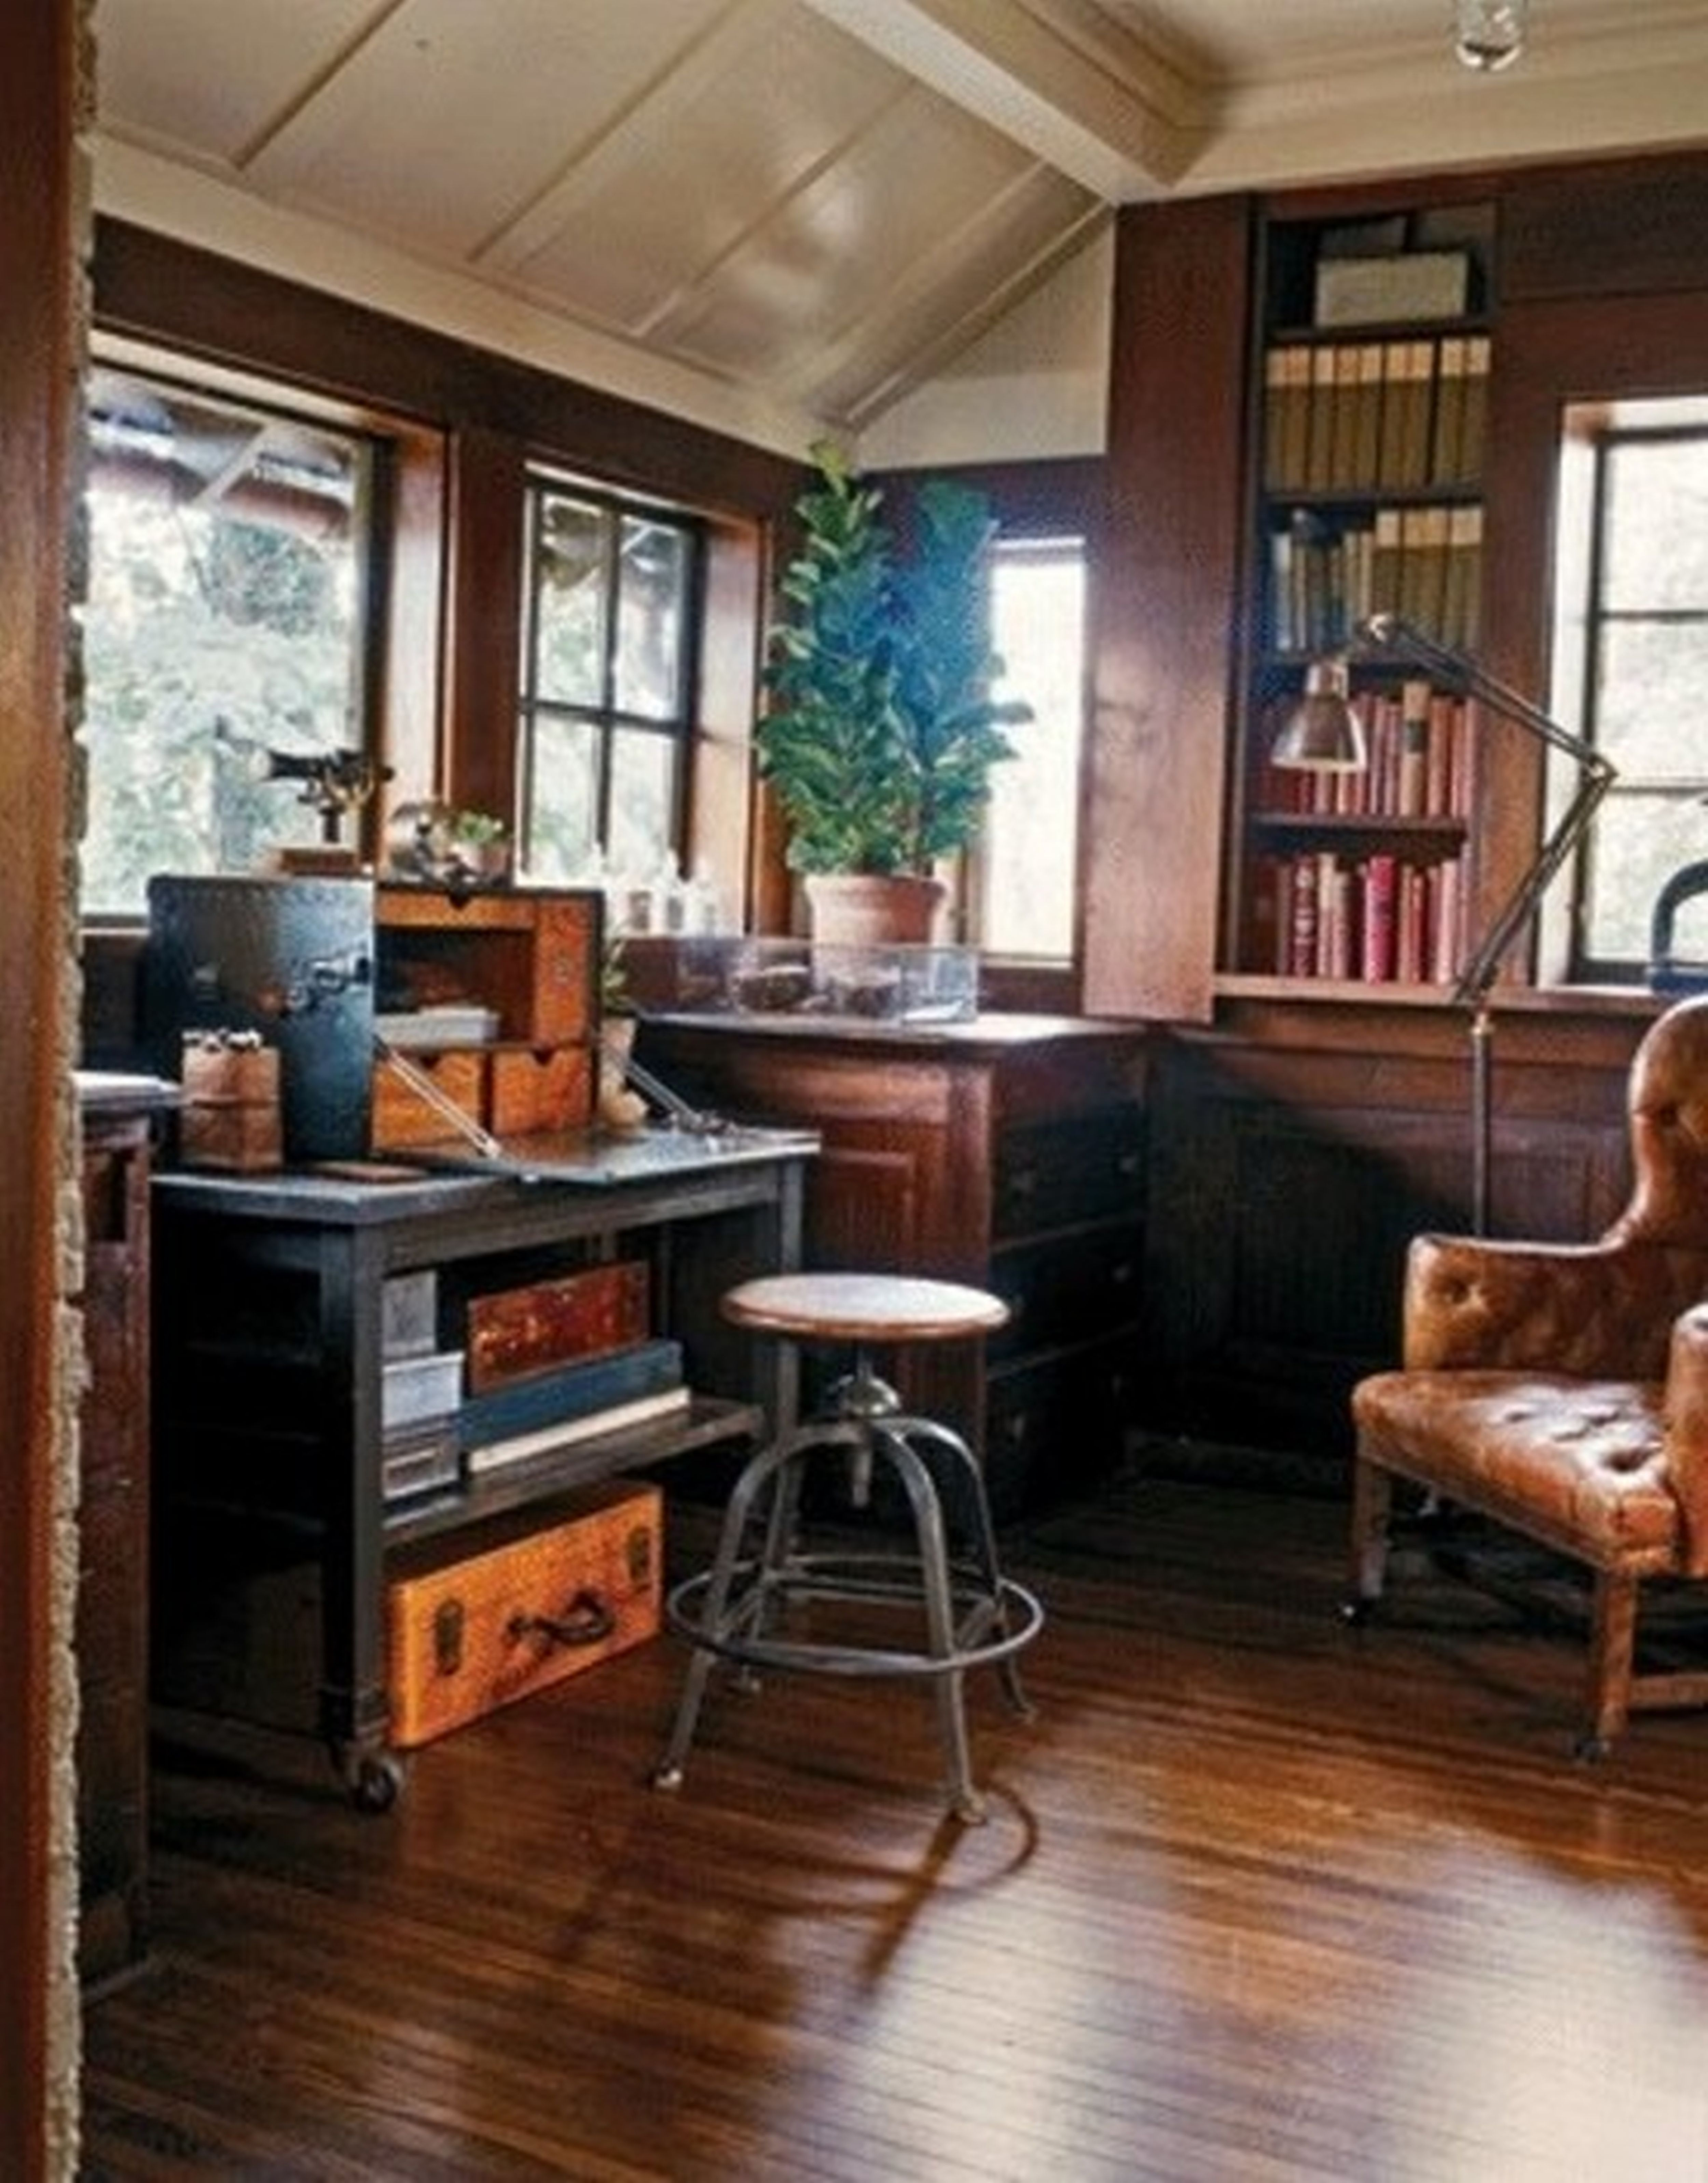 Home Office Home Office Design Home Office Interior Design Inspiration Office Desks Ideas Home